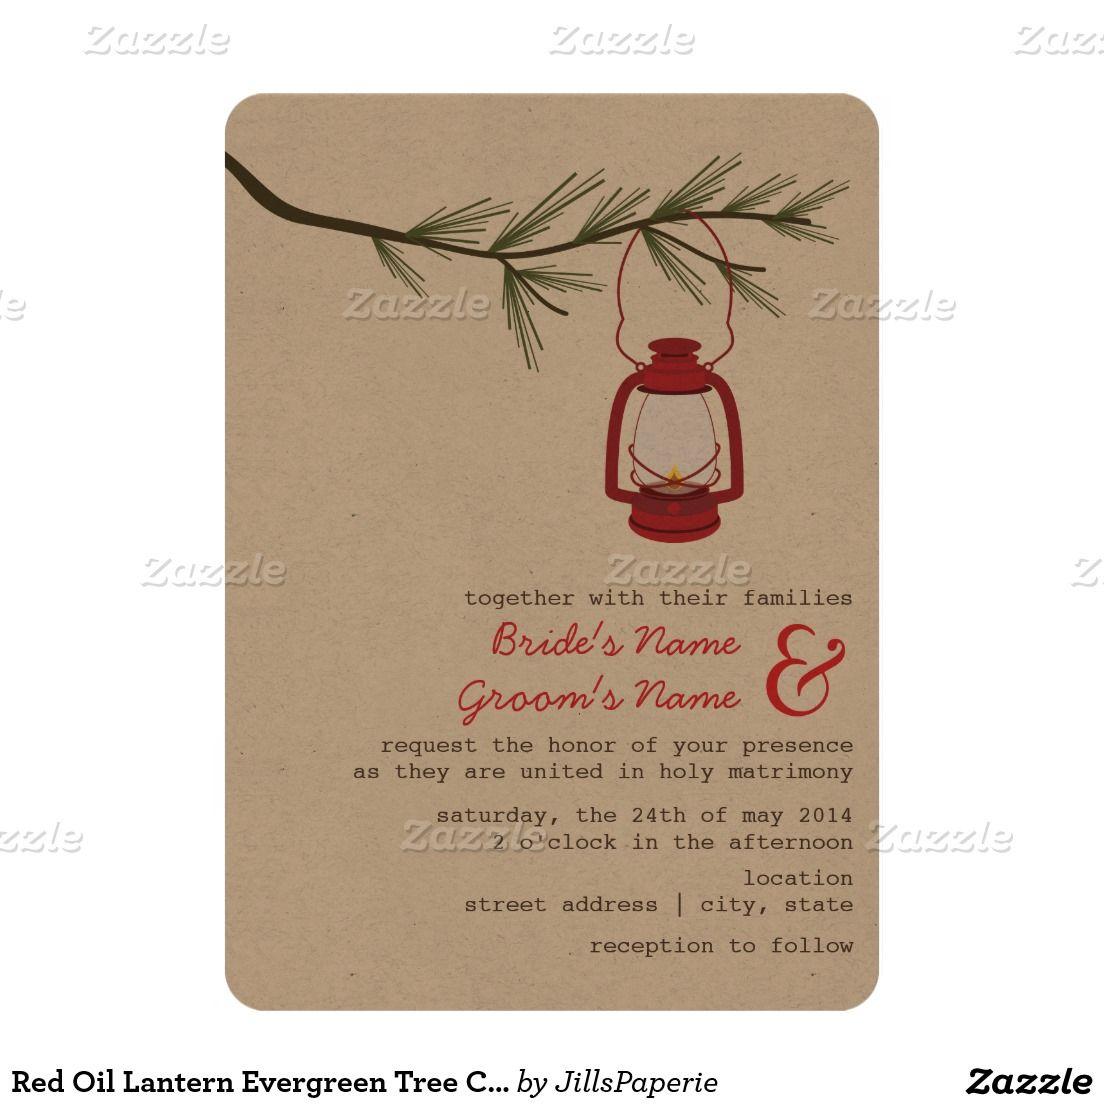 Camping Wedding Invitations Red Oil Lantern Evergreen Tree Camping Wedding Invitation In 2018